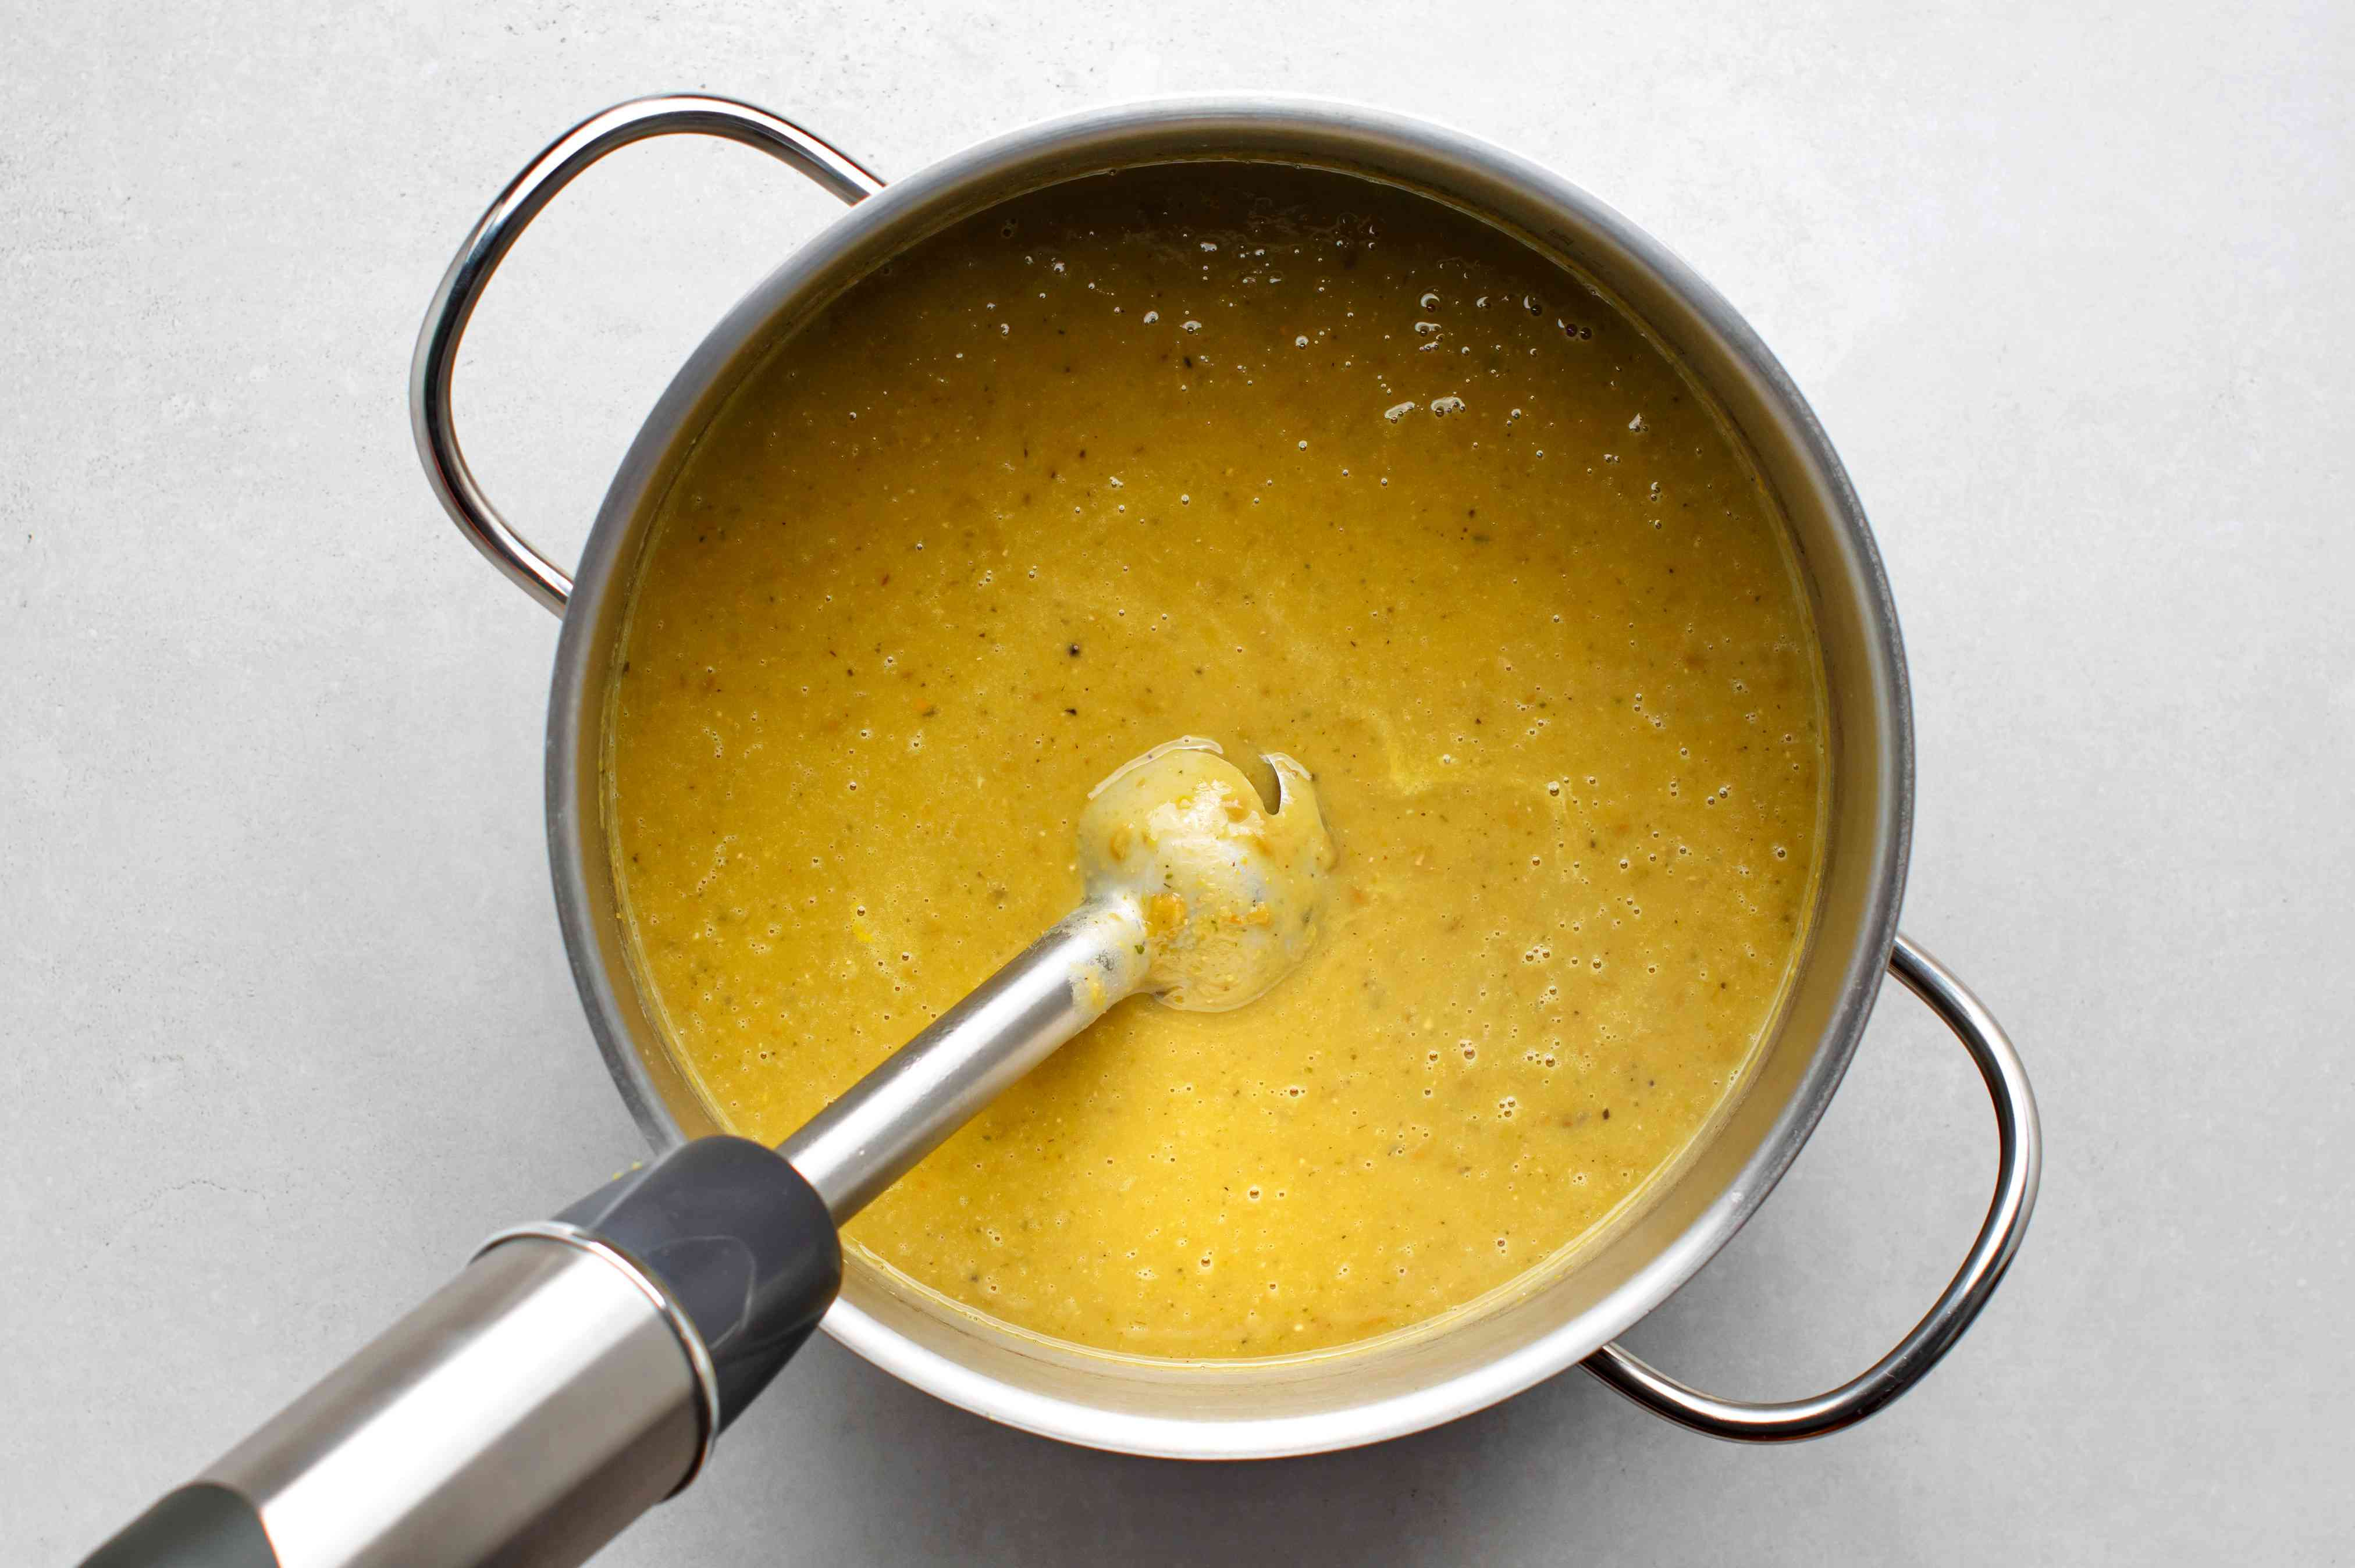 blend the Split Pea Lentil Soup using an immersion blender